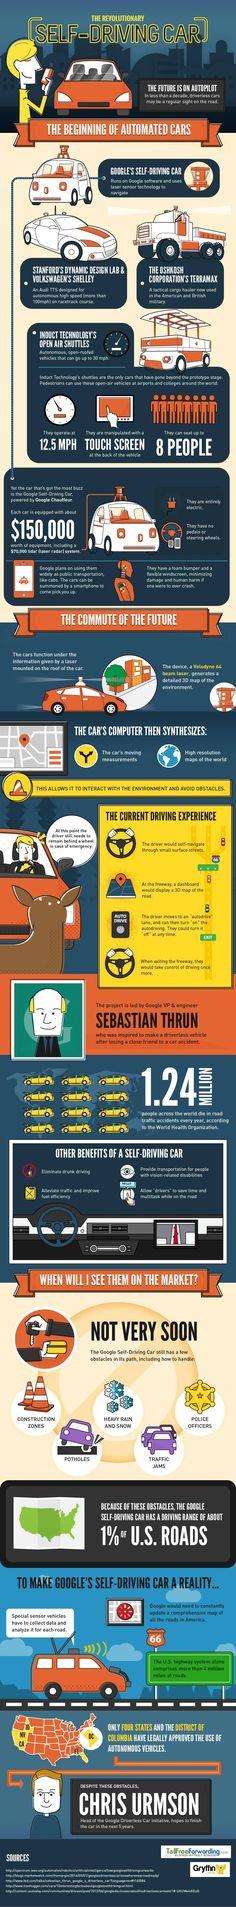 The Revolutionary Self-Driving Car.